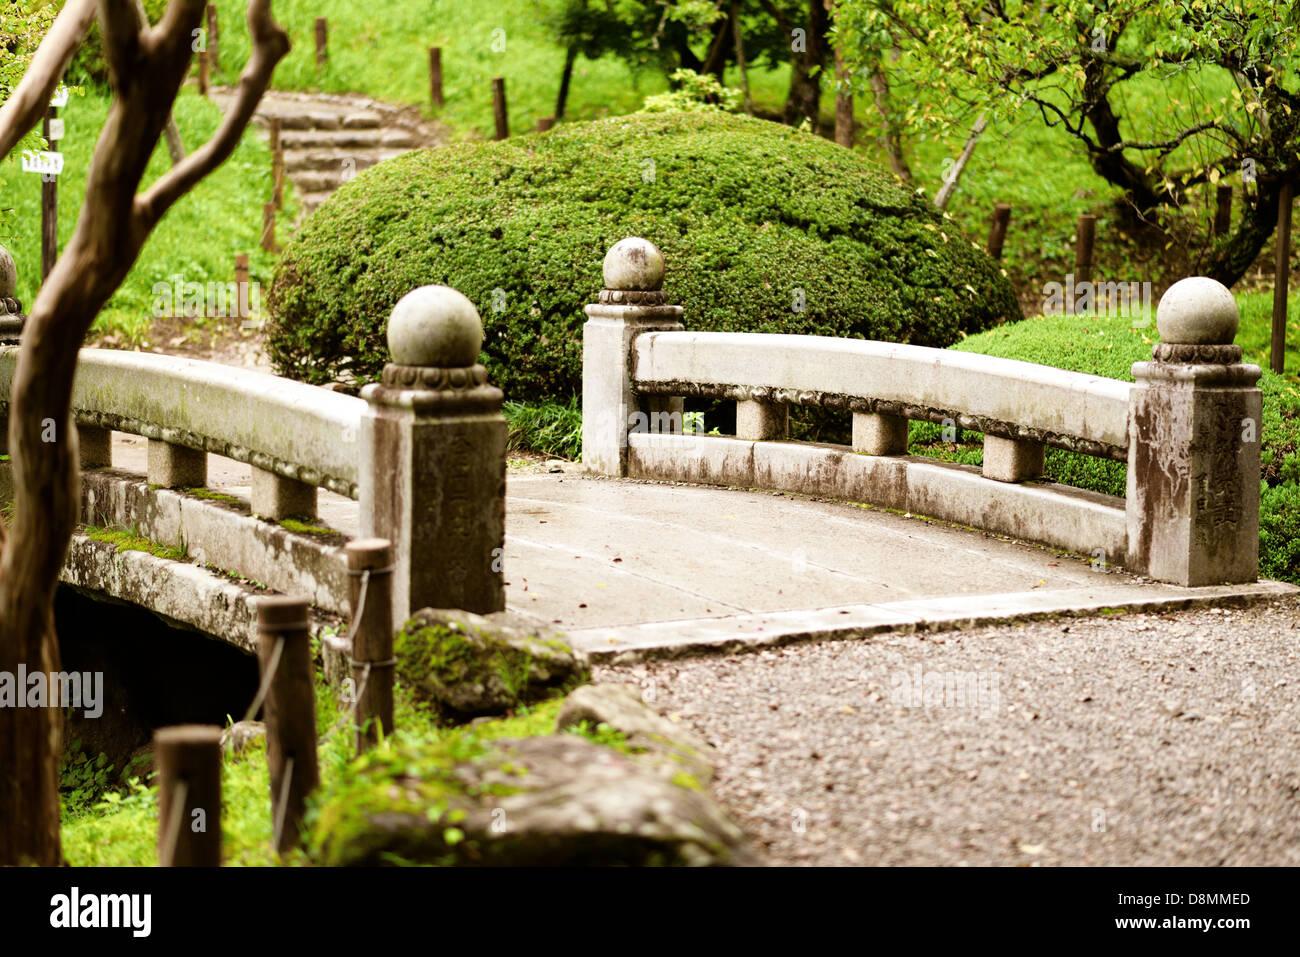 Garden in Japan - Stock Image